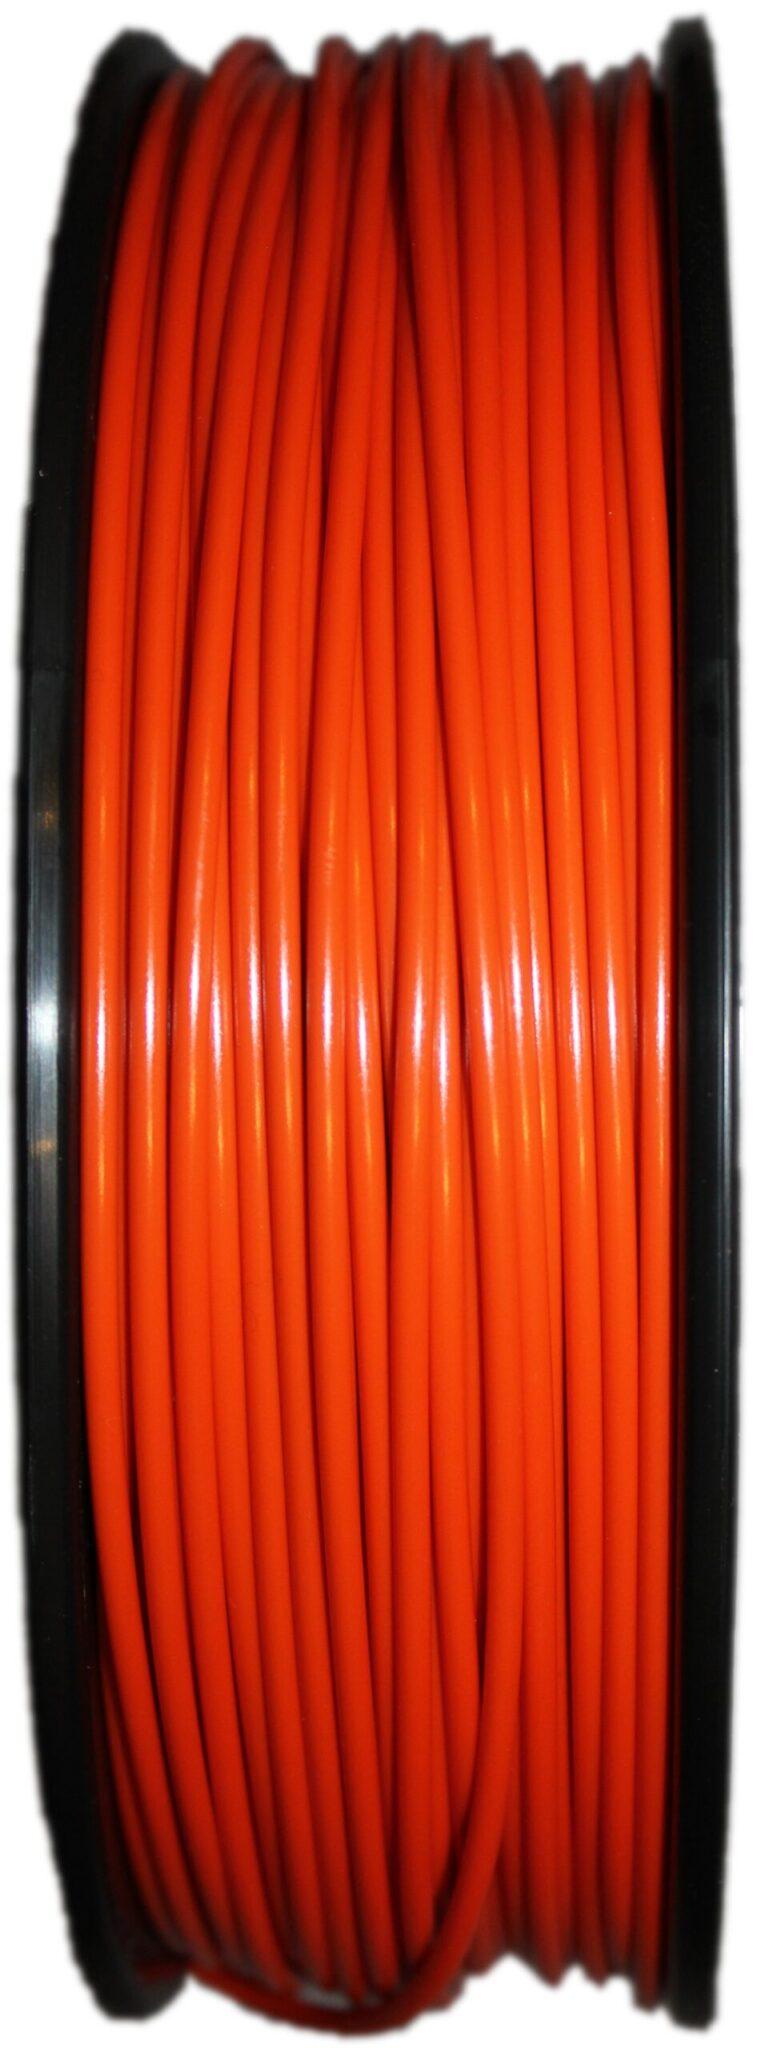 Aurarum PLA 3D Printer Filament - Orange 2.85mm 1Kg